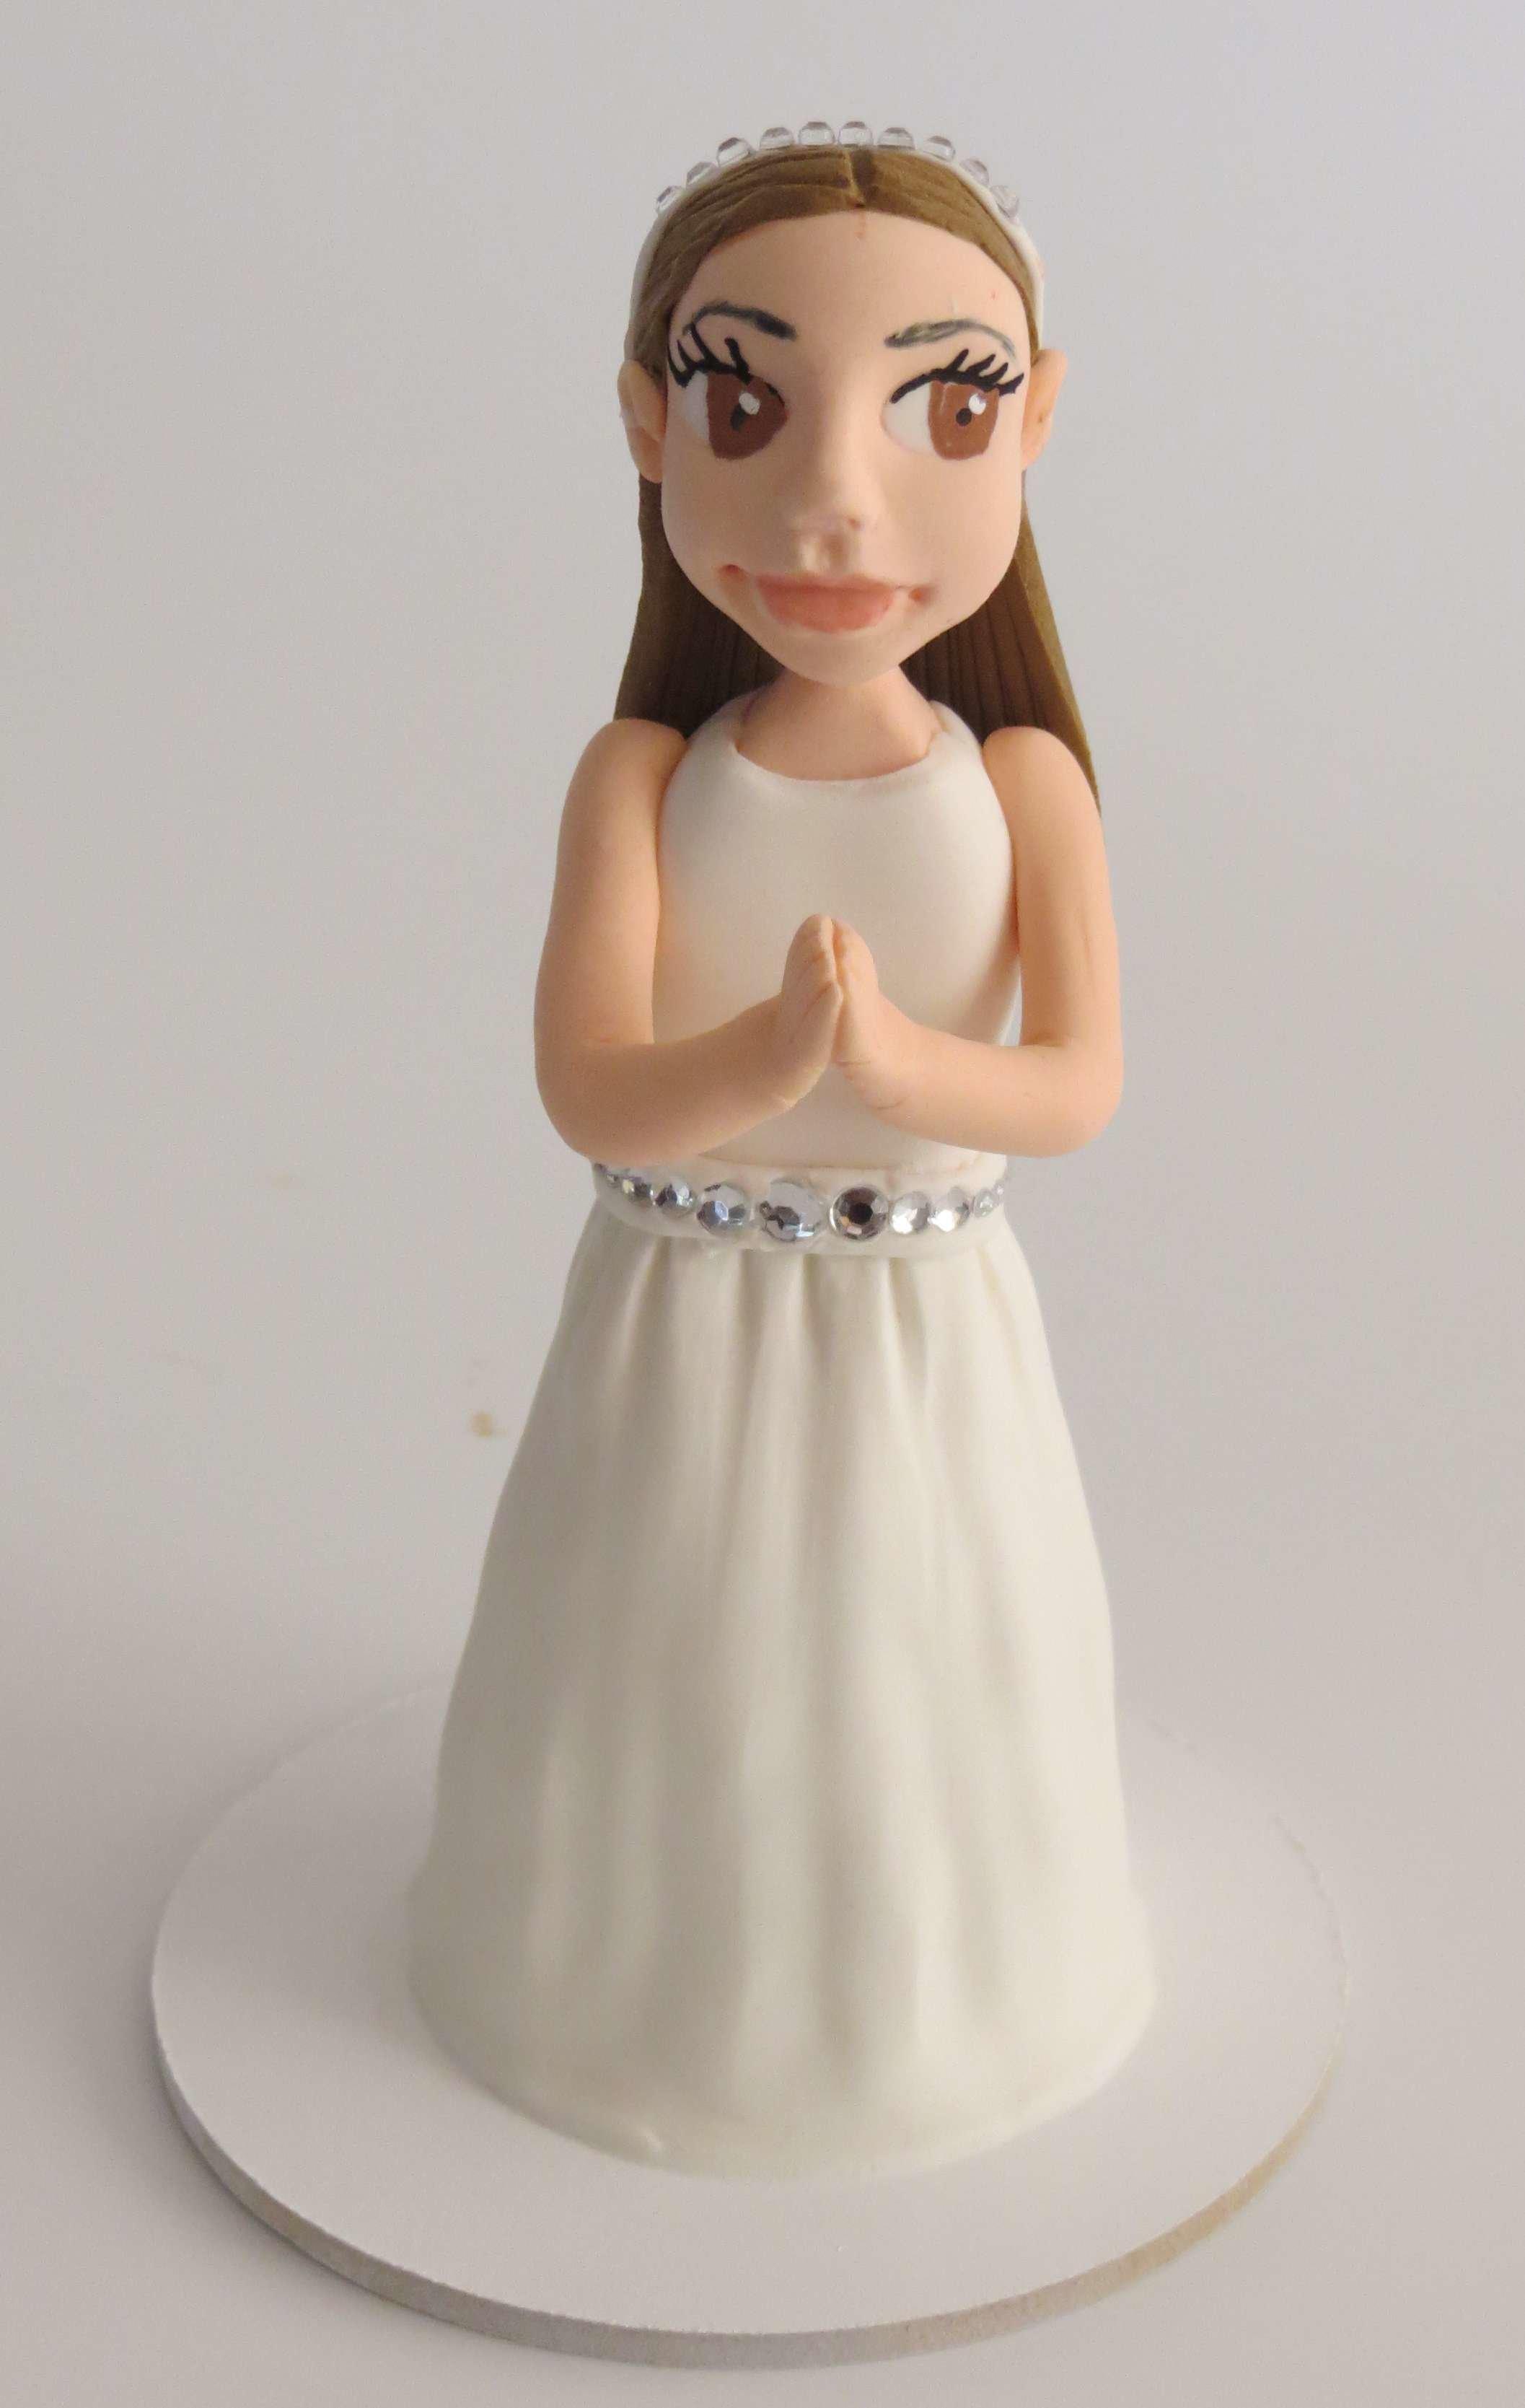 Special Occasion Child Figurine